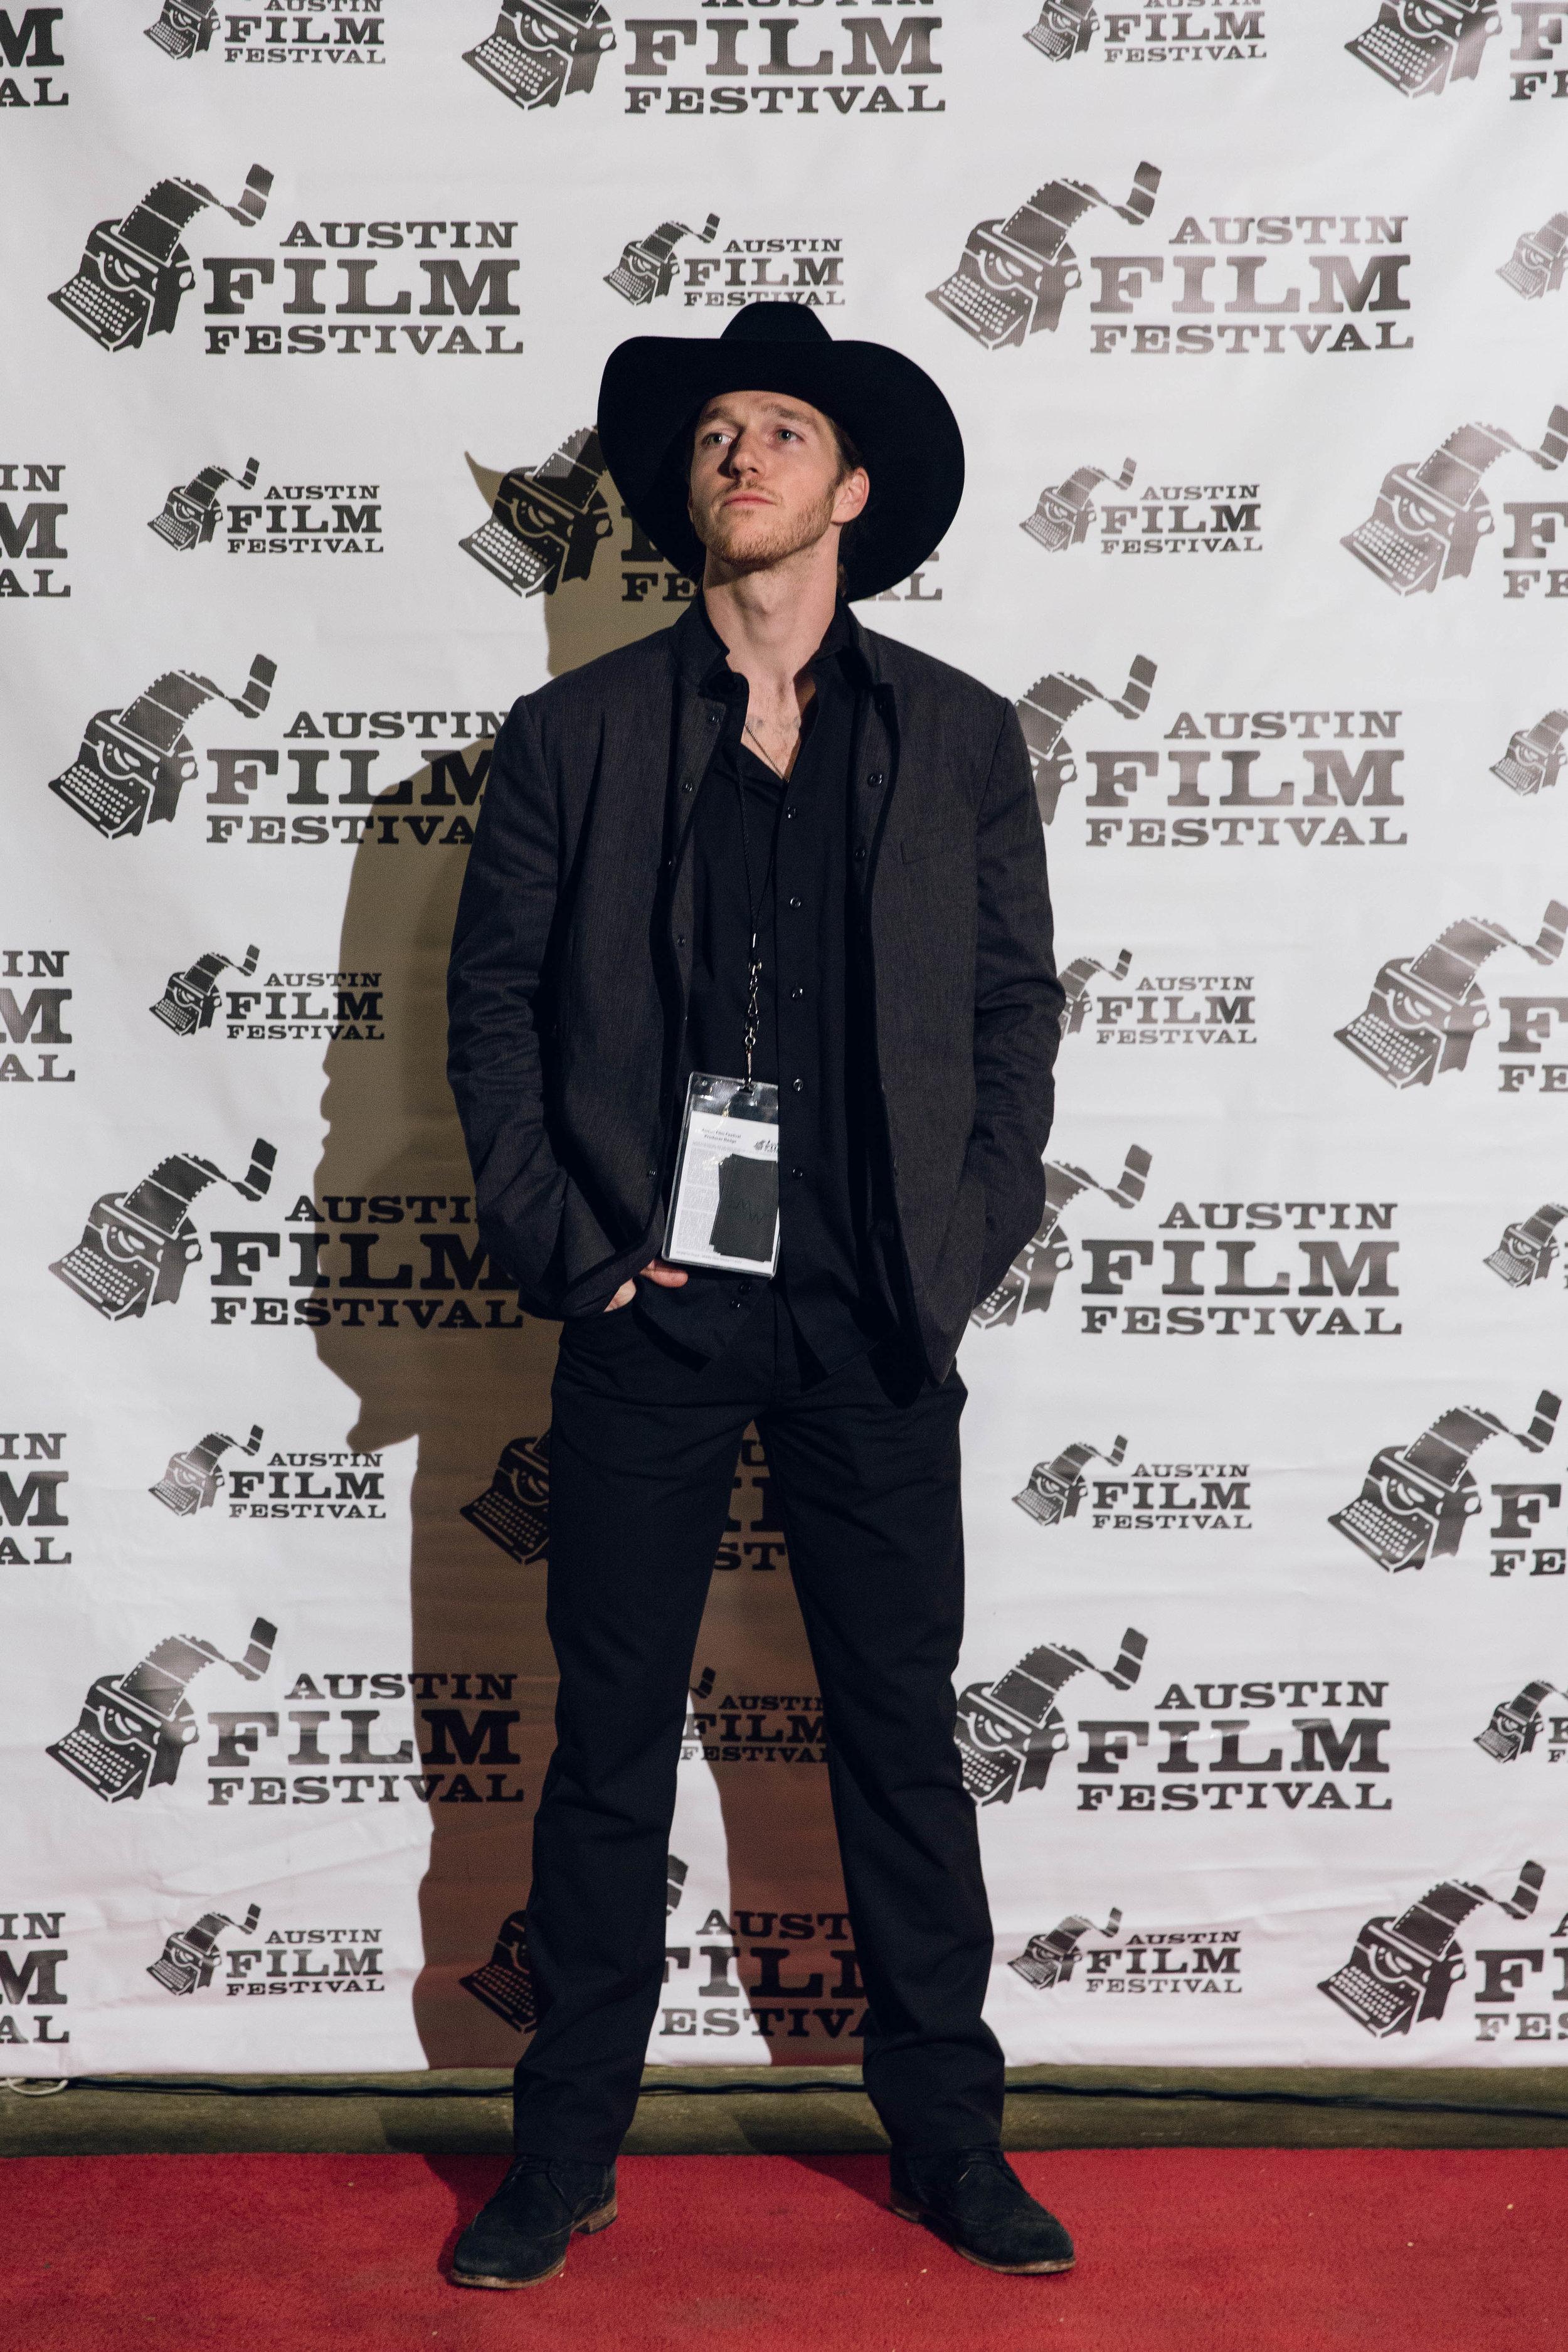 Southern-Tale-Austin-Film-Fest-Kirby-Gladstein-2017-2891.jpg